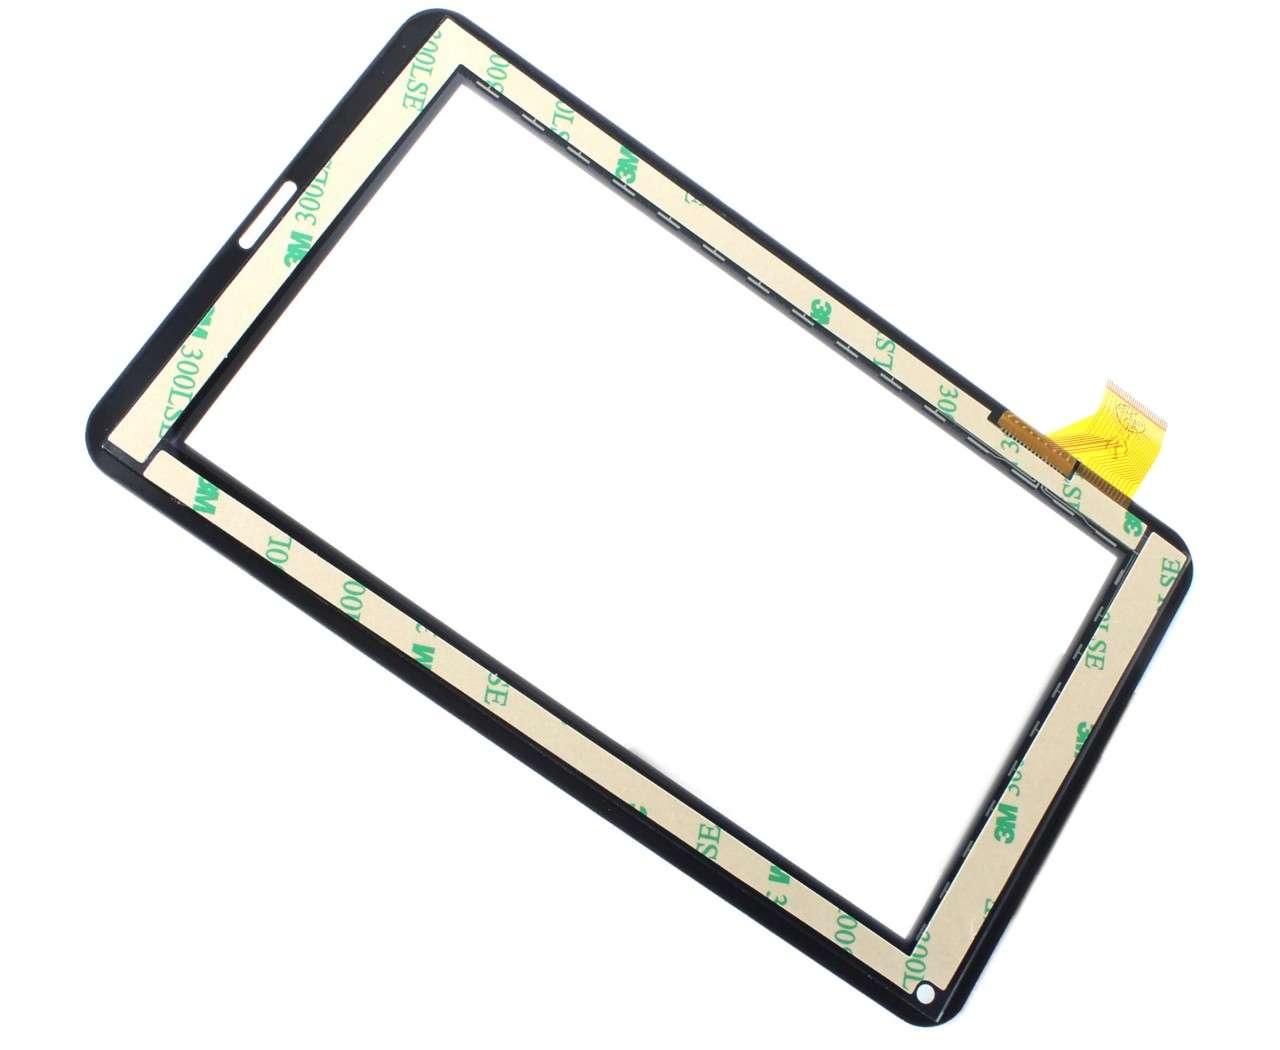 Touchscreen Digitizer Exclusiv TAB 704DC Geam Sticla Tableta imagine powerlaptop.ro 2021